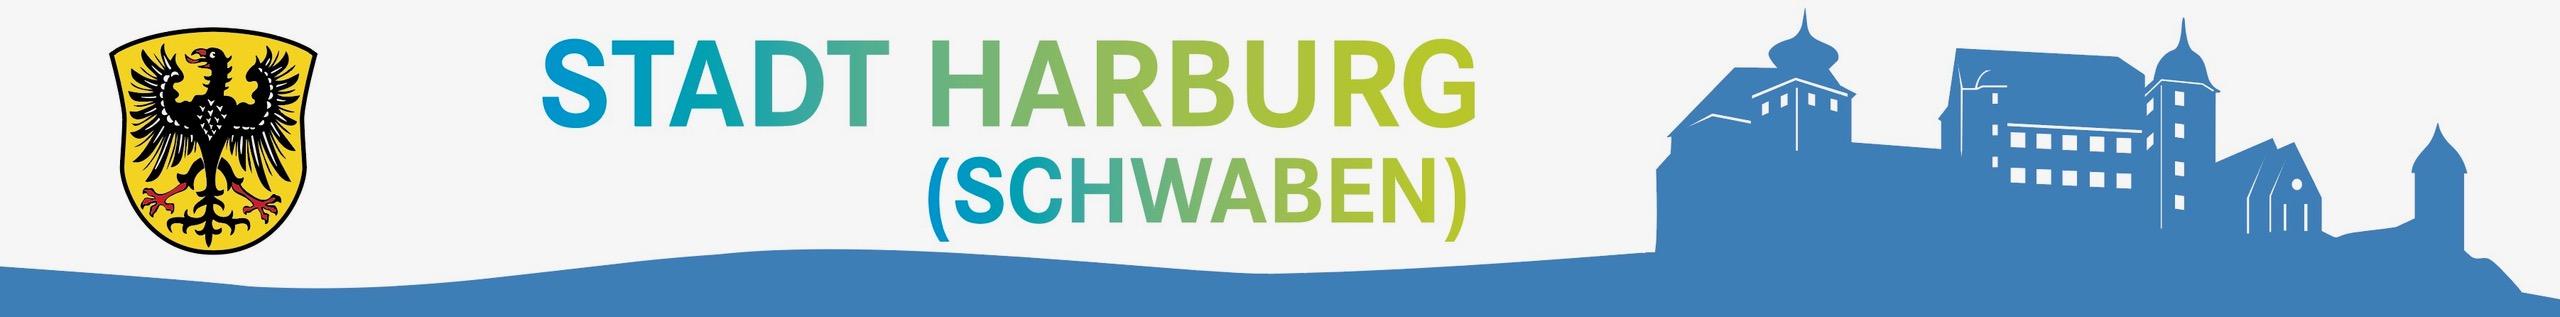 Stadt Harburg